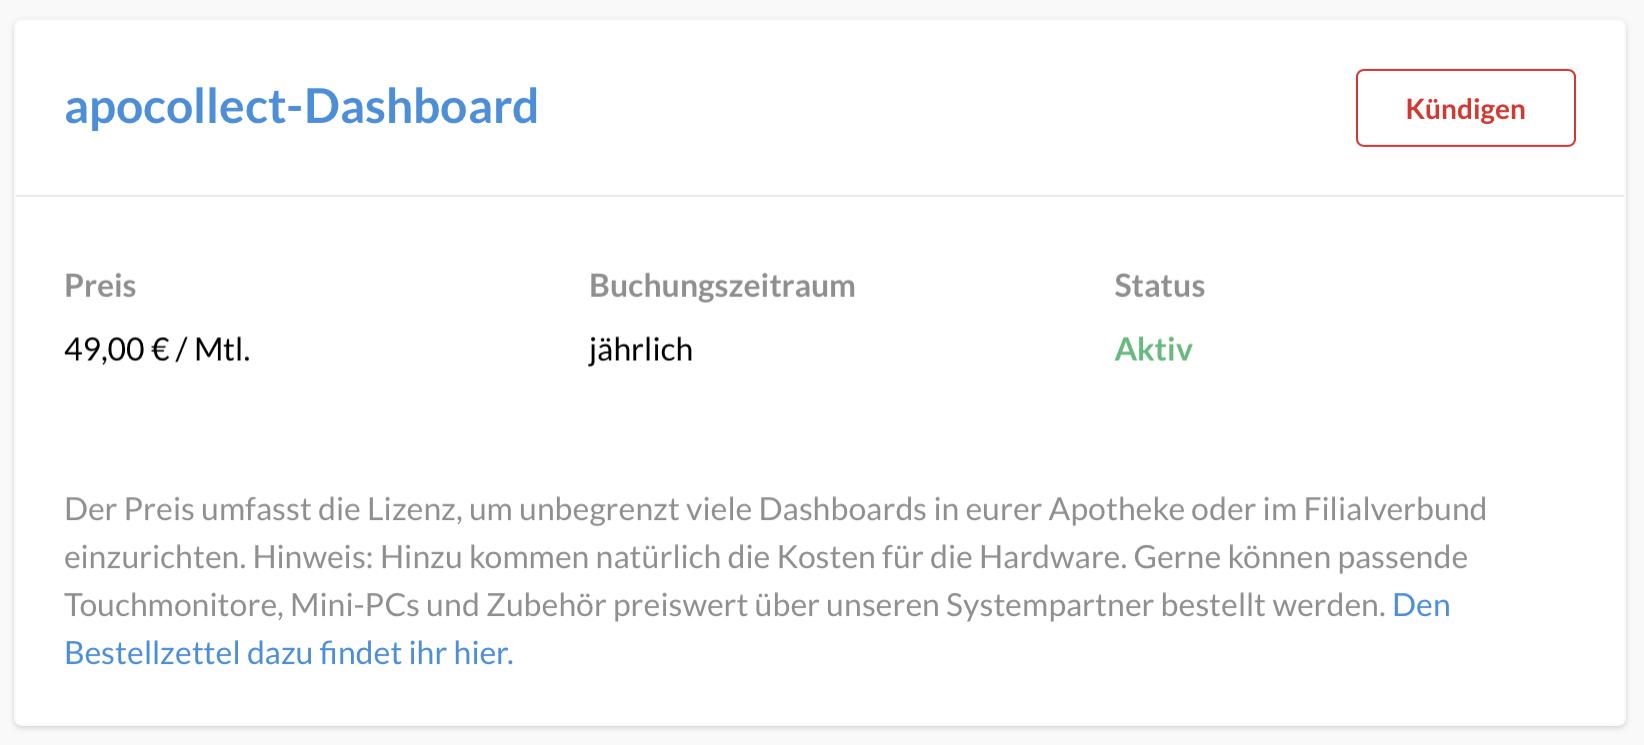 https://hilfe.apocollect.de/storage/images/faq/screenshots/dashboard-aktiv.jpeg